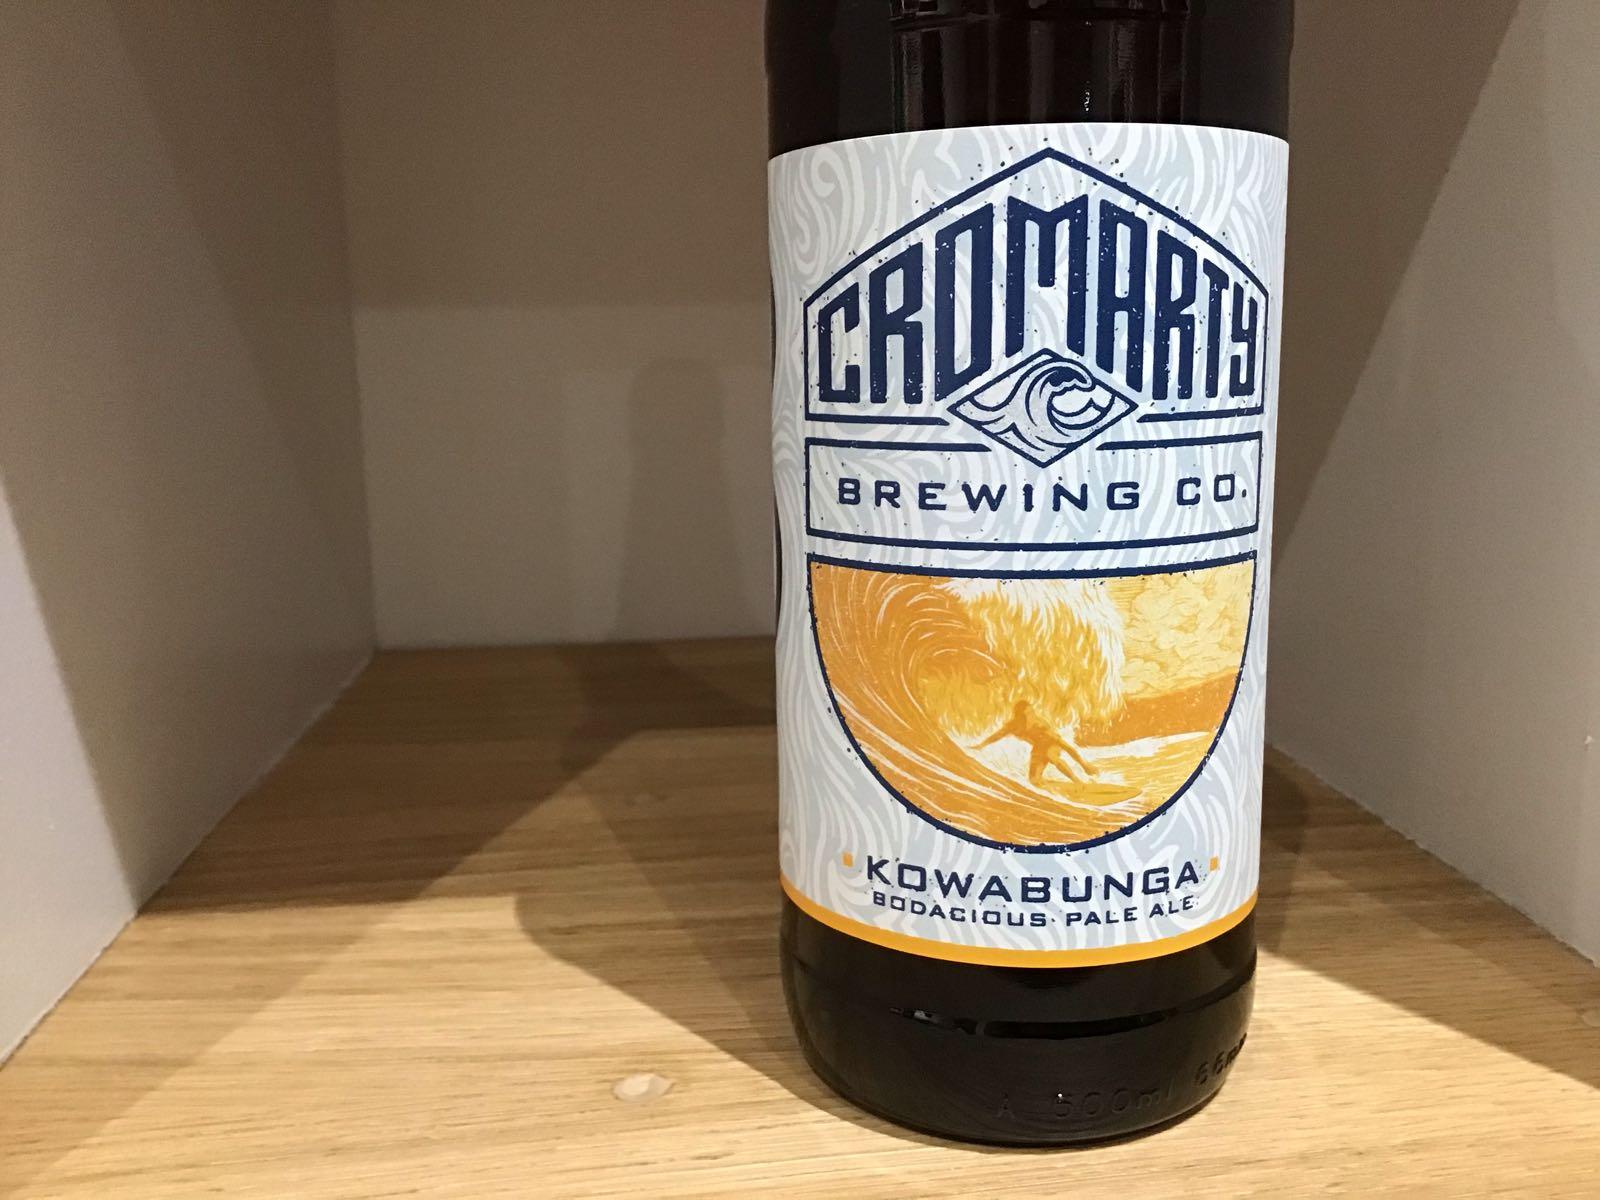 Cromarty Brewing Co: Kowabunga